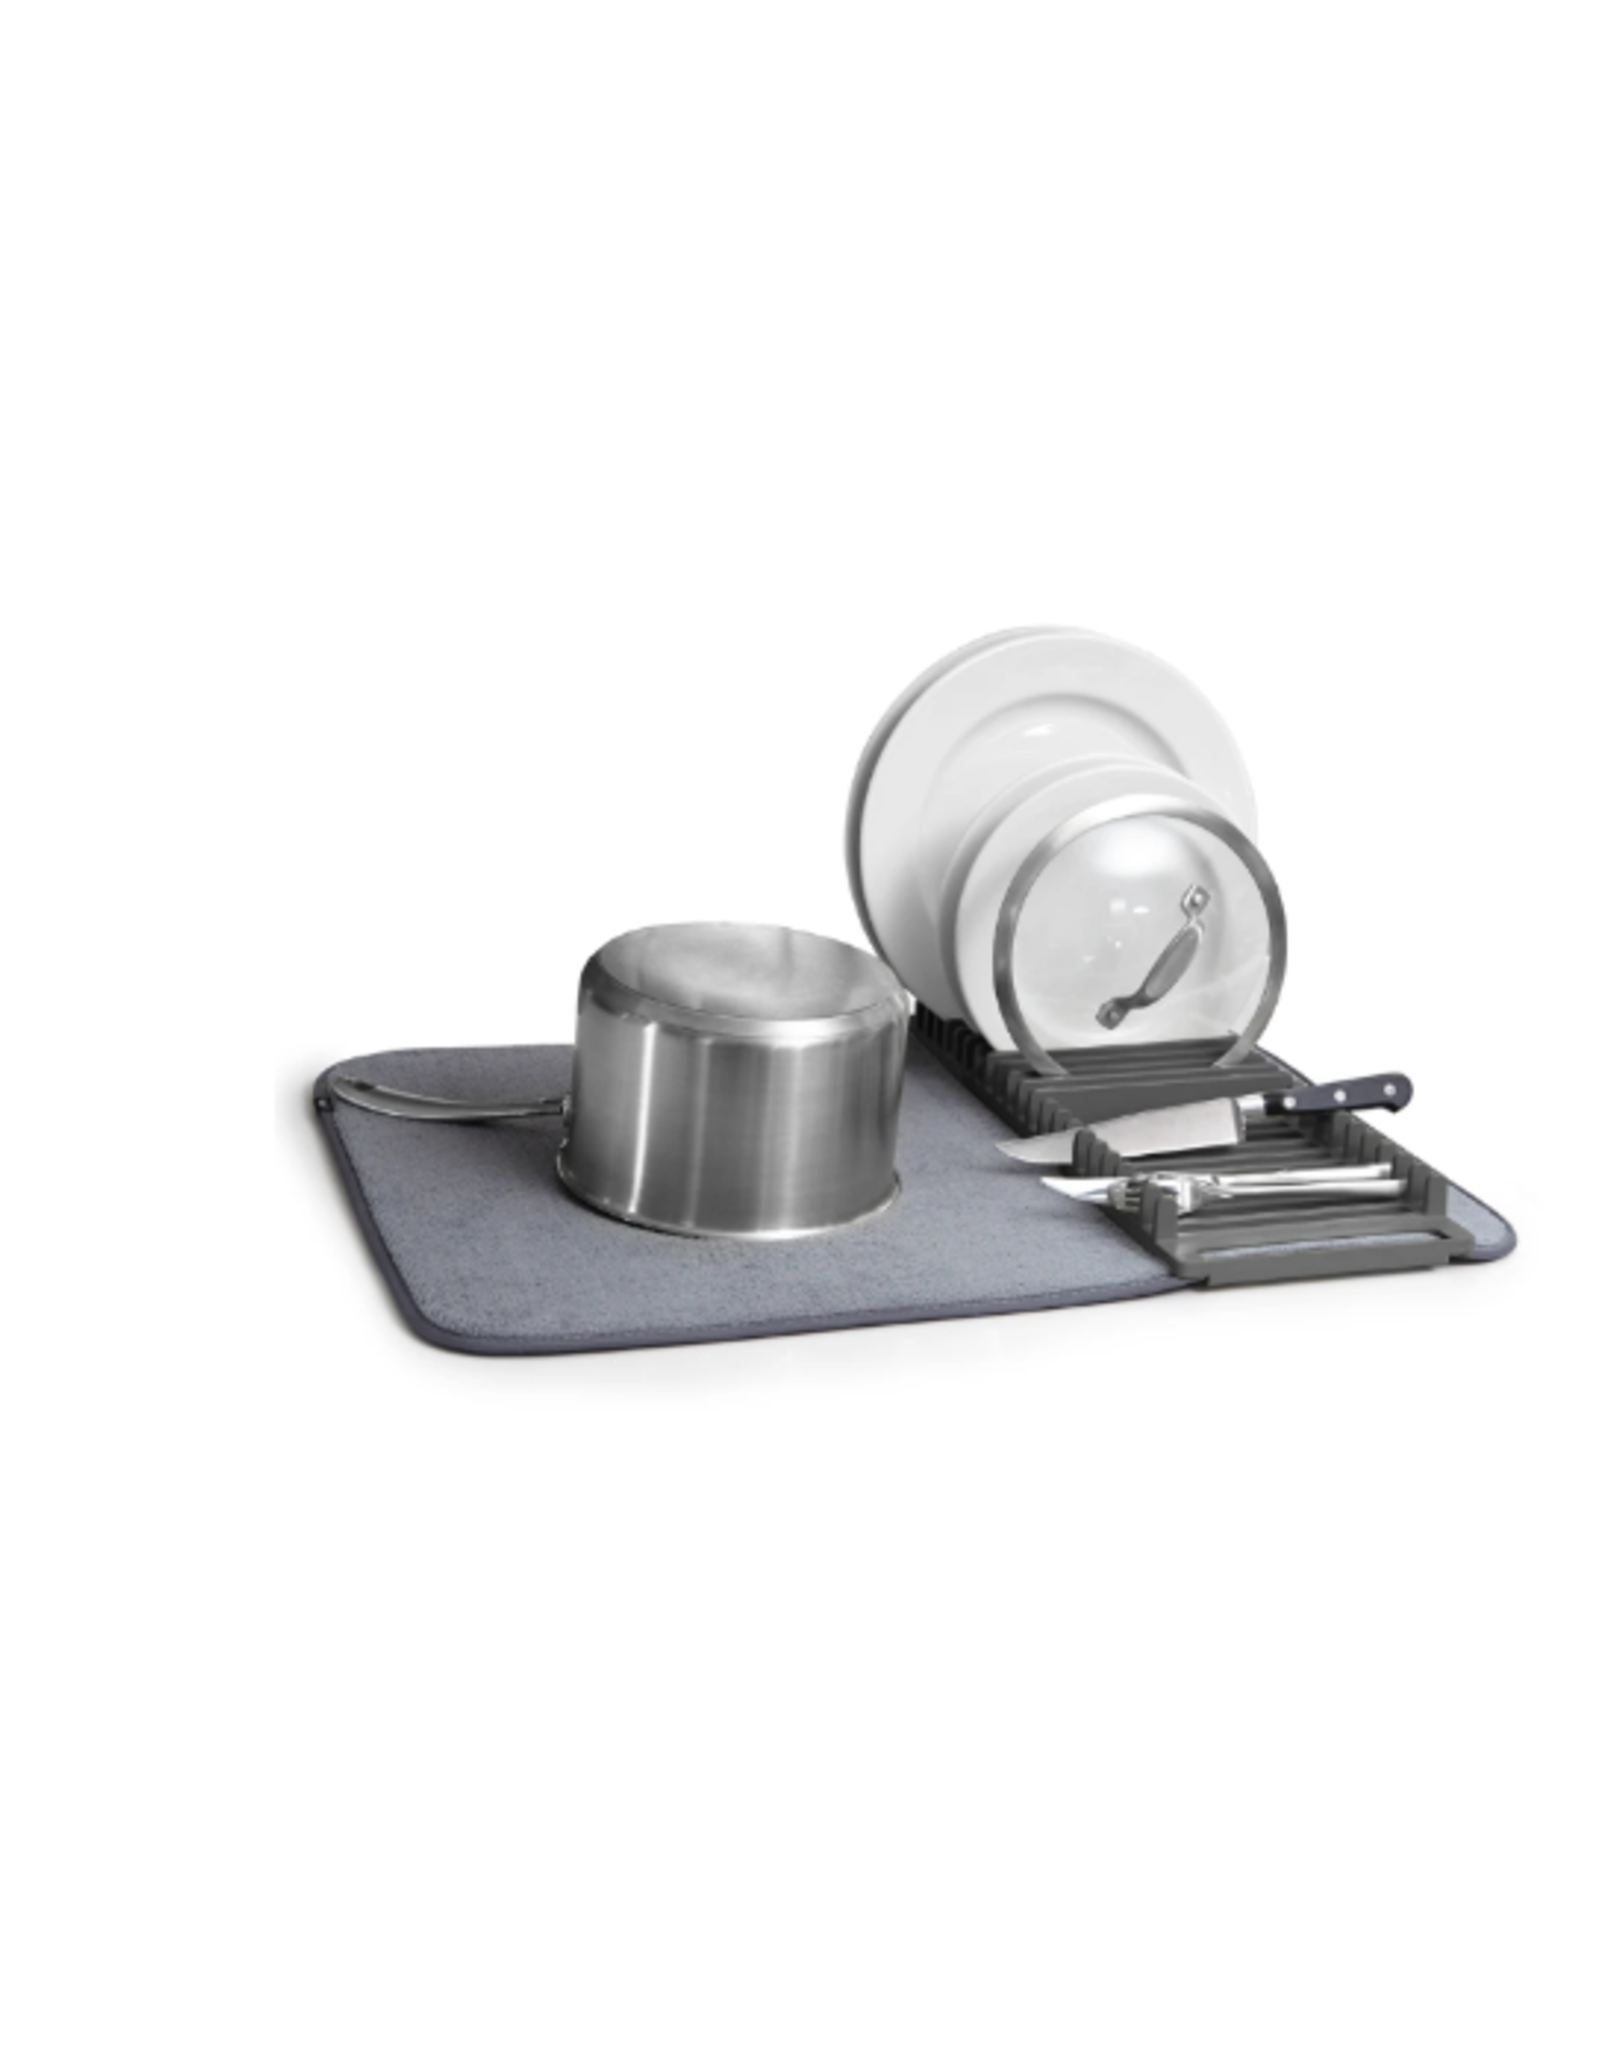 Umbra Udry Dish Drying Mat, Charcoal